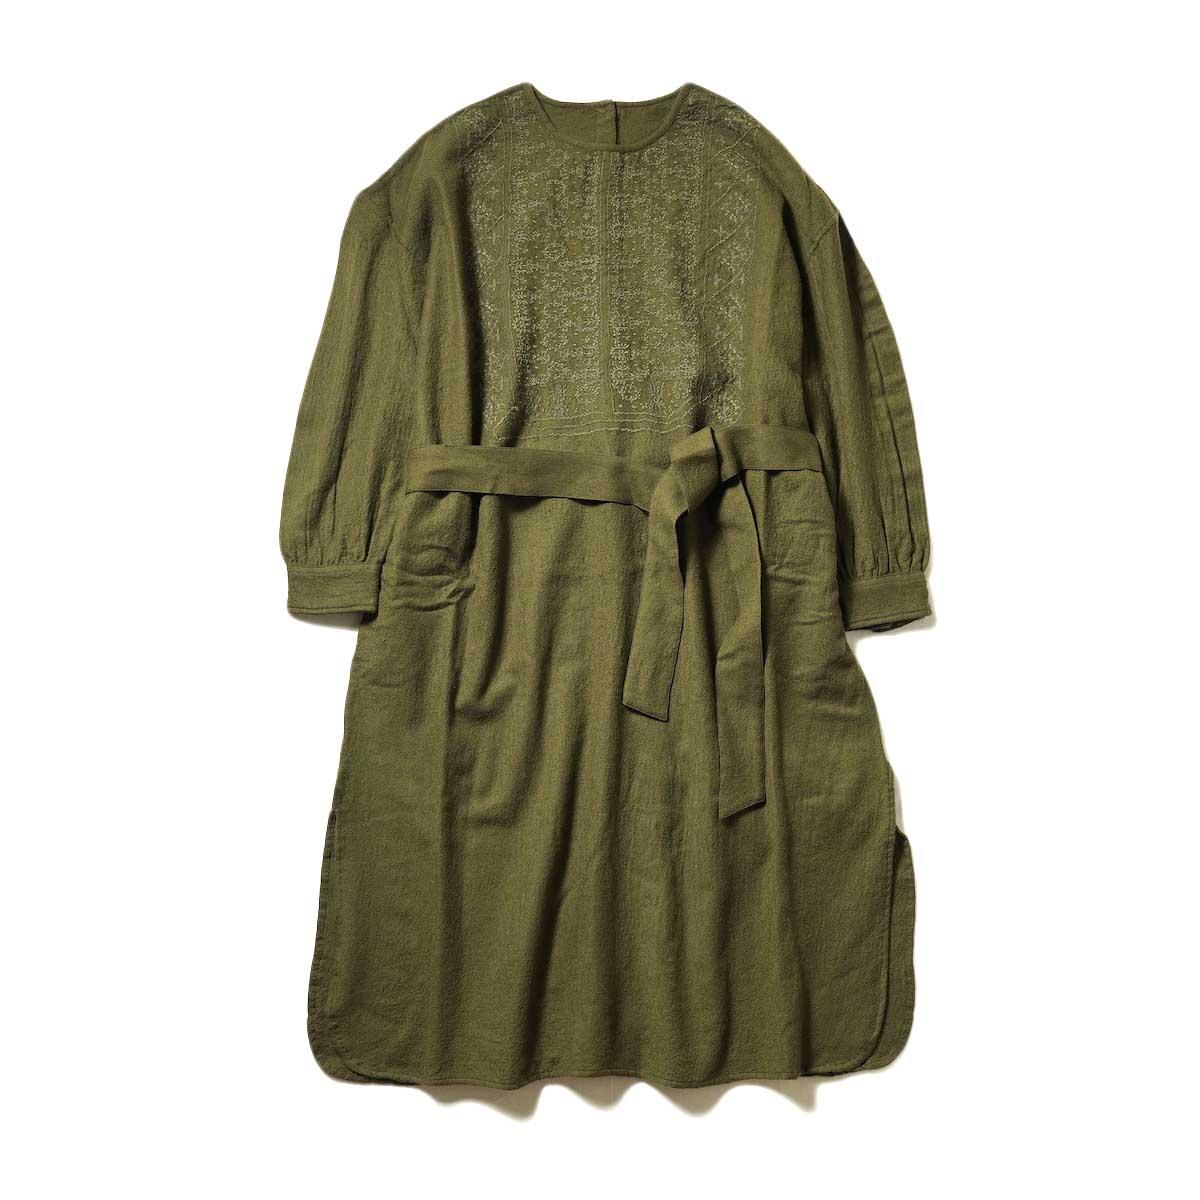 maison de soil / BACK OPENING CREN-NECK EMS SHIRT DRESS (Dk. Olive)